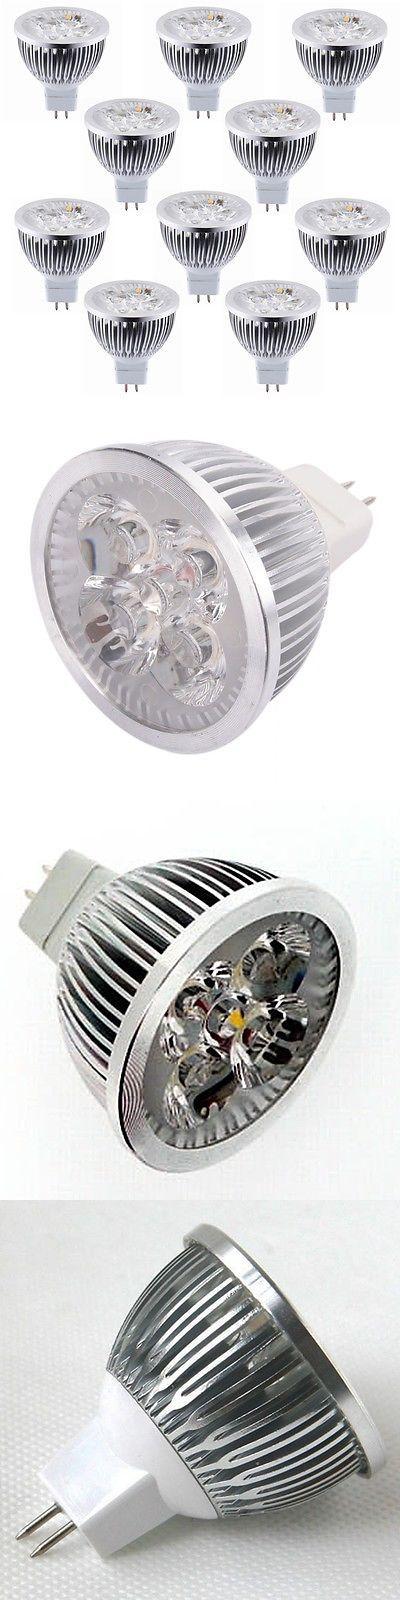 Lamps Lighting And Ceiling Fans 56141 Lot Of 10 White 12V 4W Mr16 Led